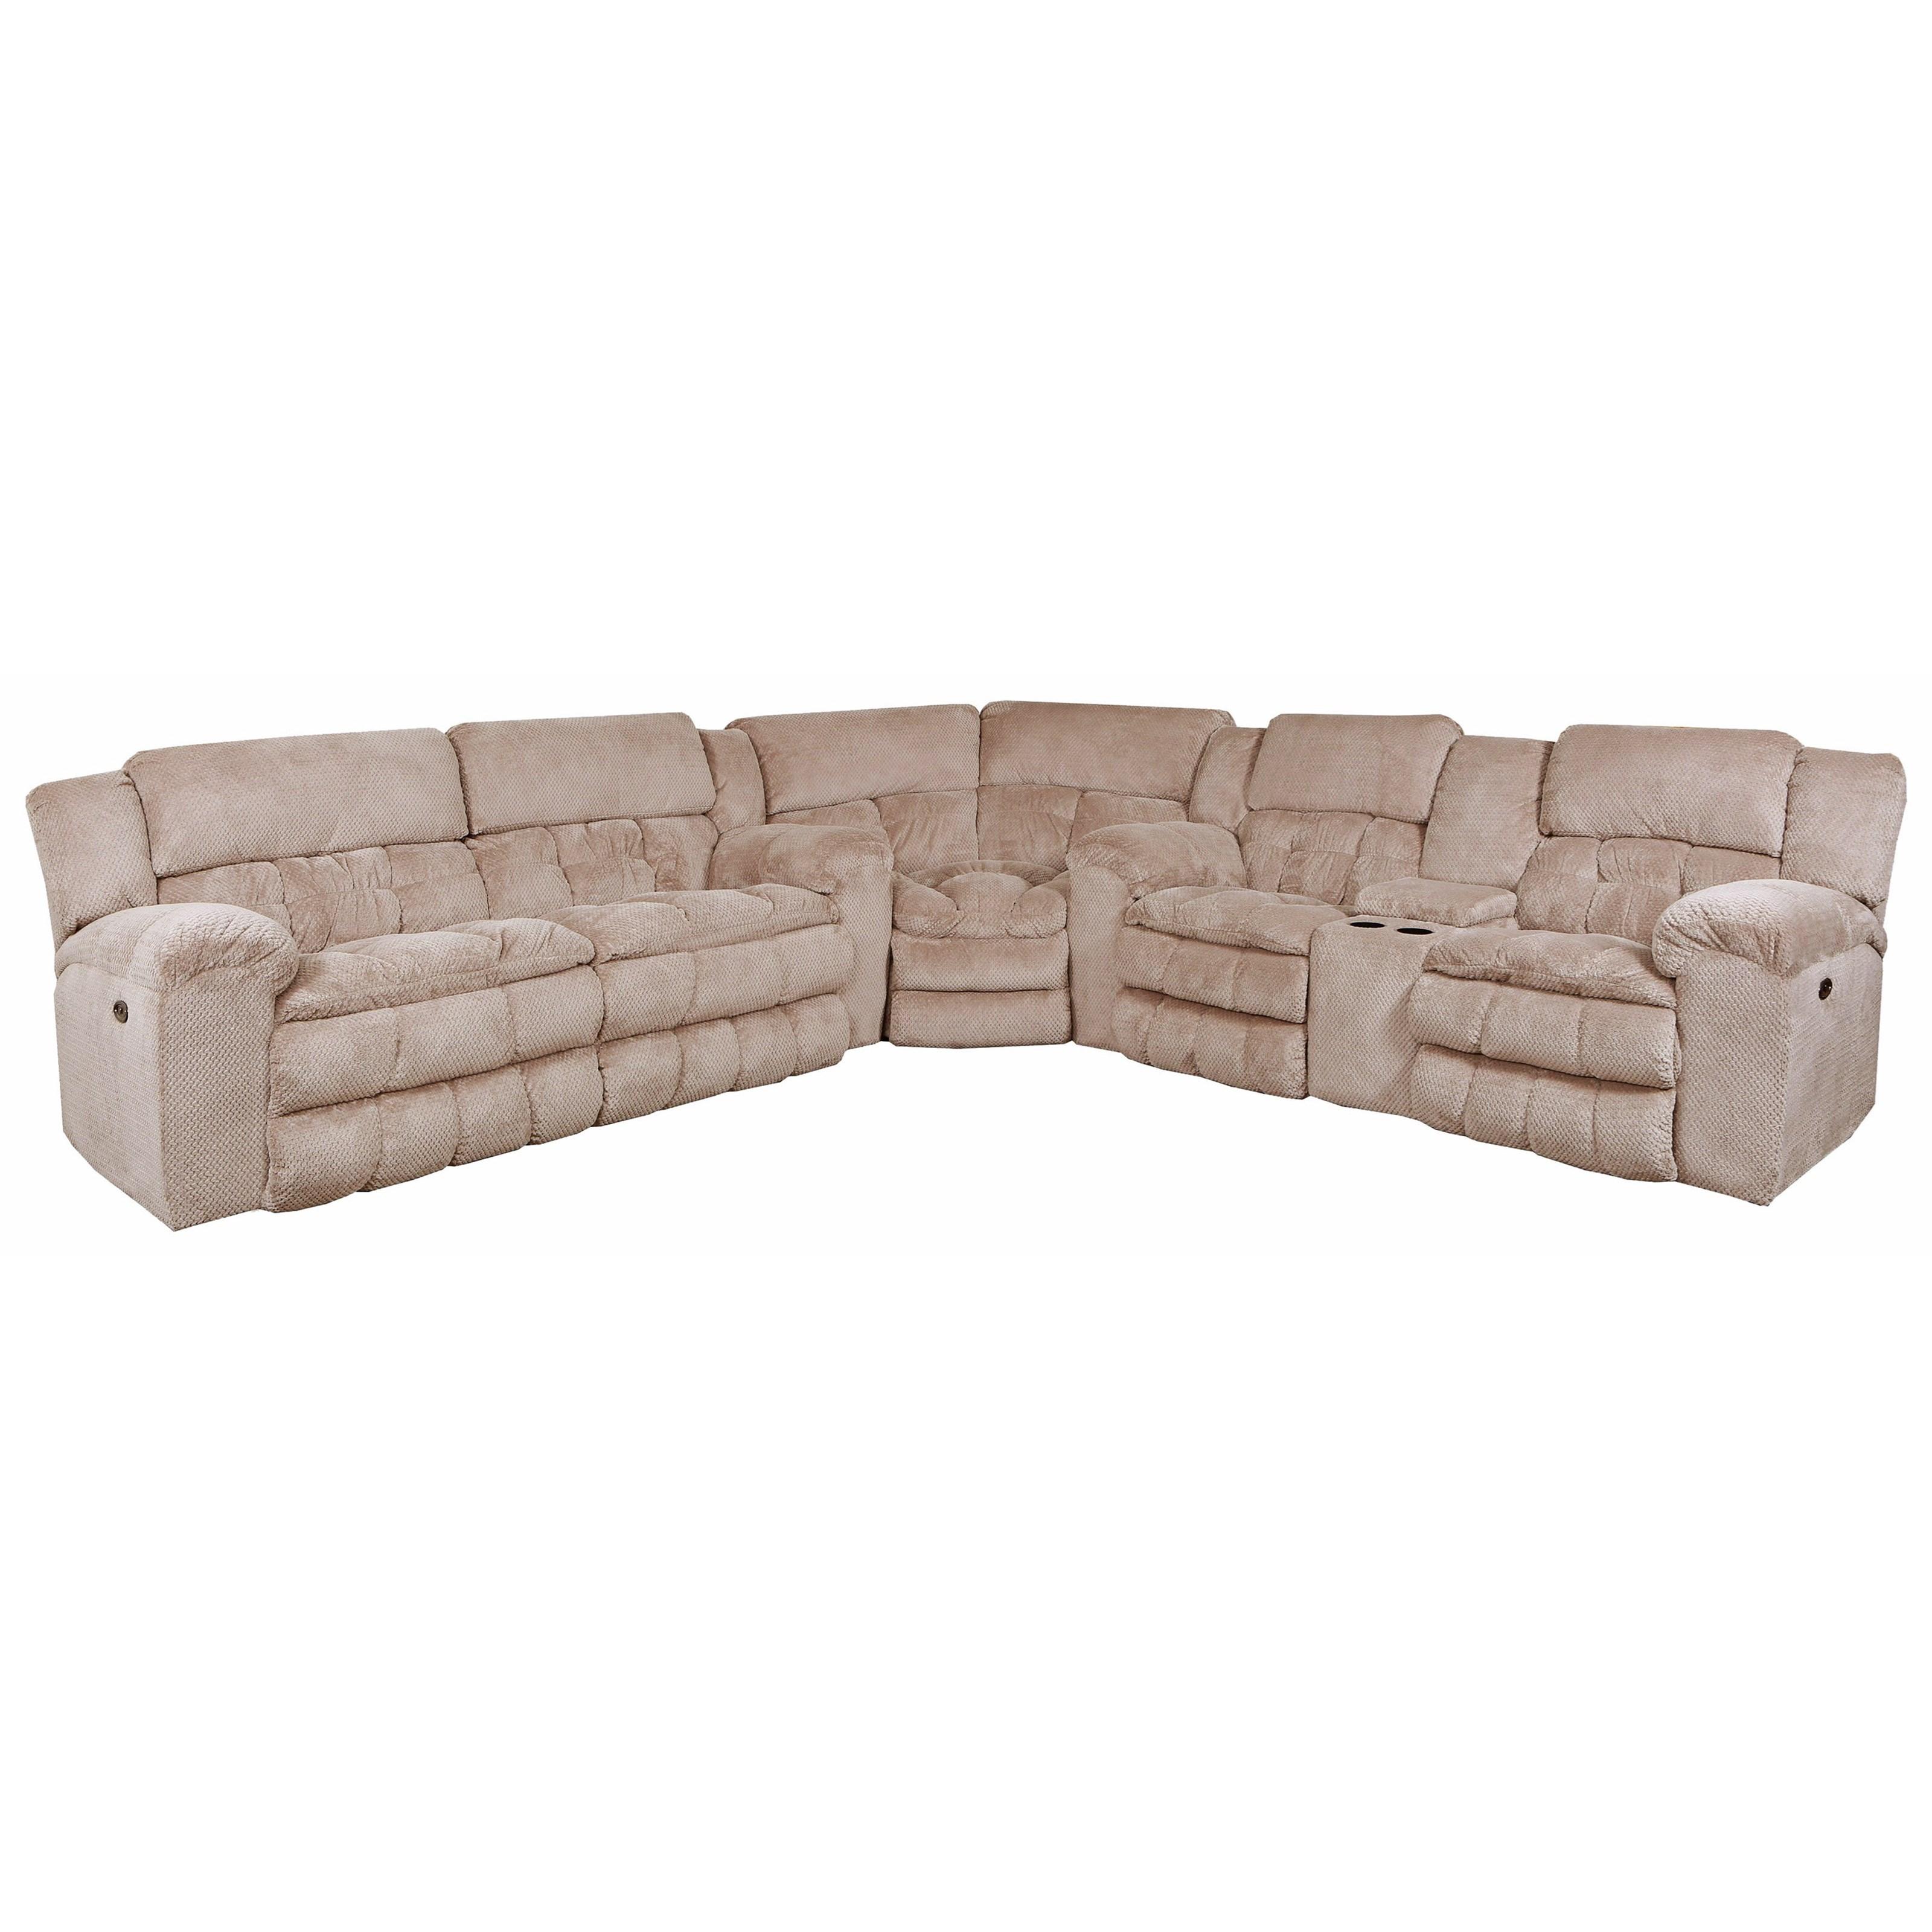 United Furniture Industries 50580BR Power Reclining Sectional - Item Number: 50580BRPS+PLS+W+Madeline Sandstone